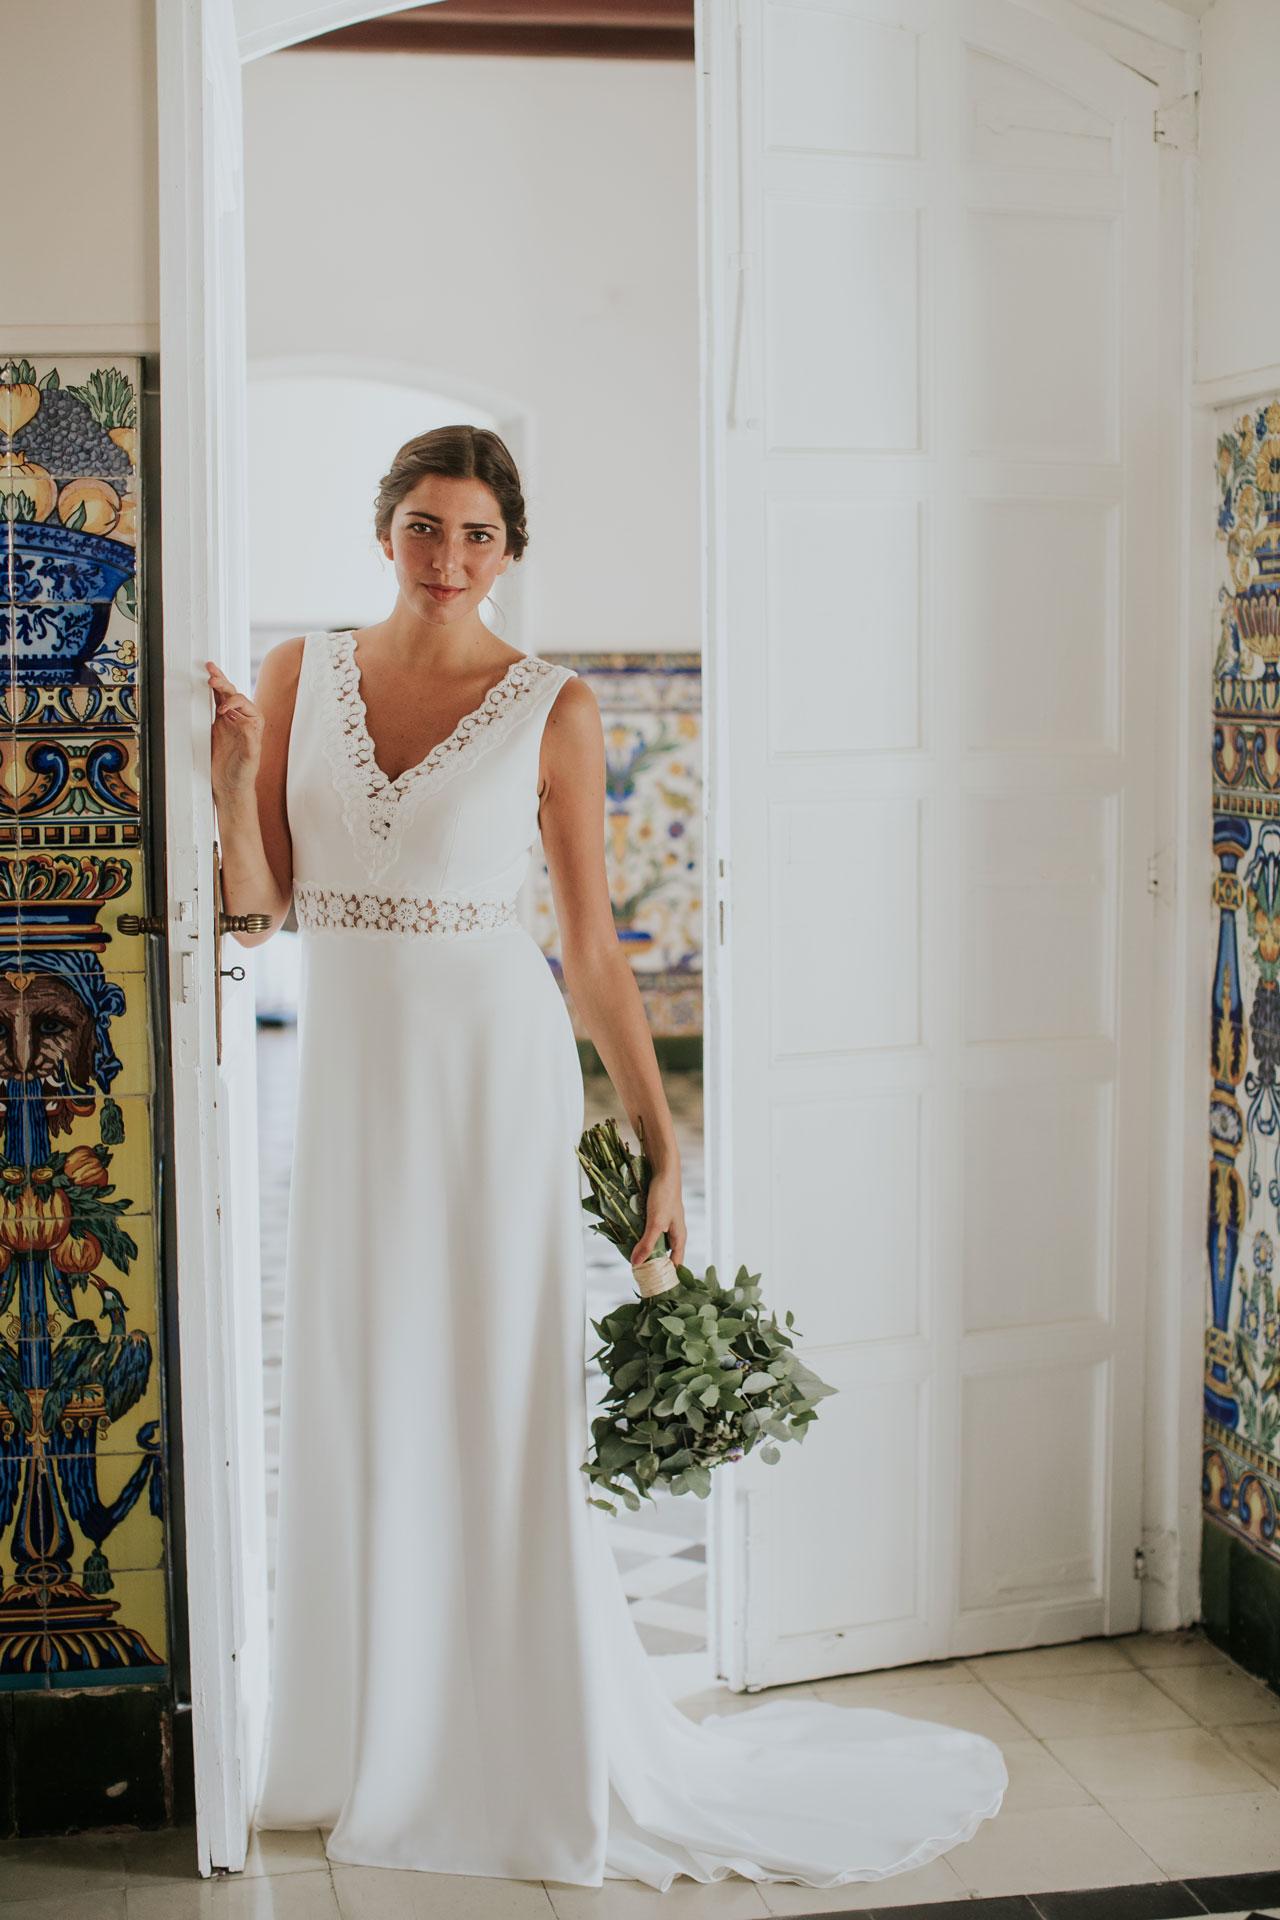 Vestit de núvia Camila / L'AVETIS